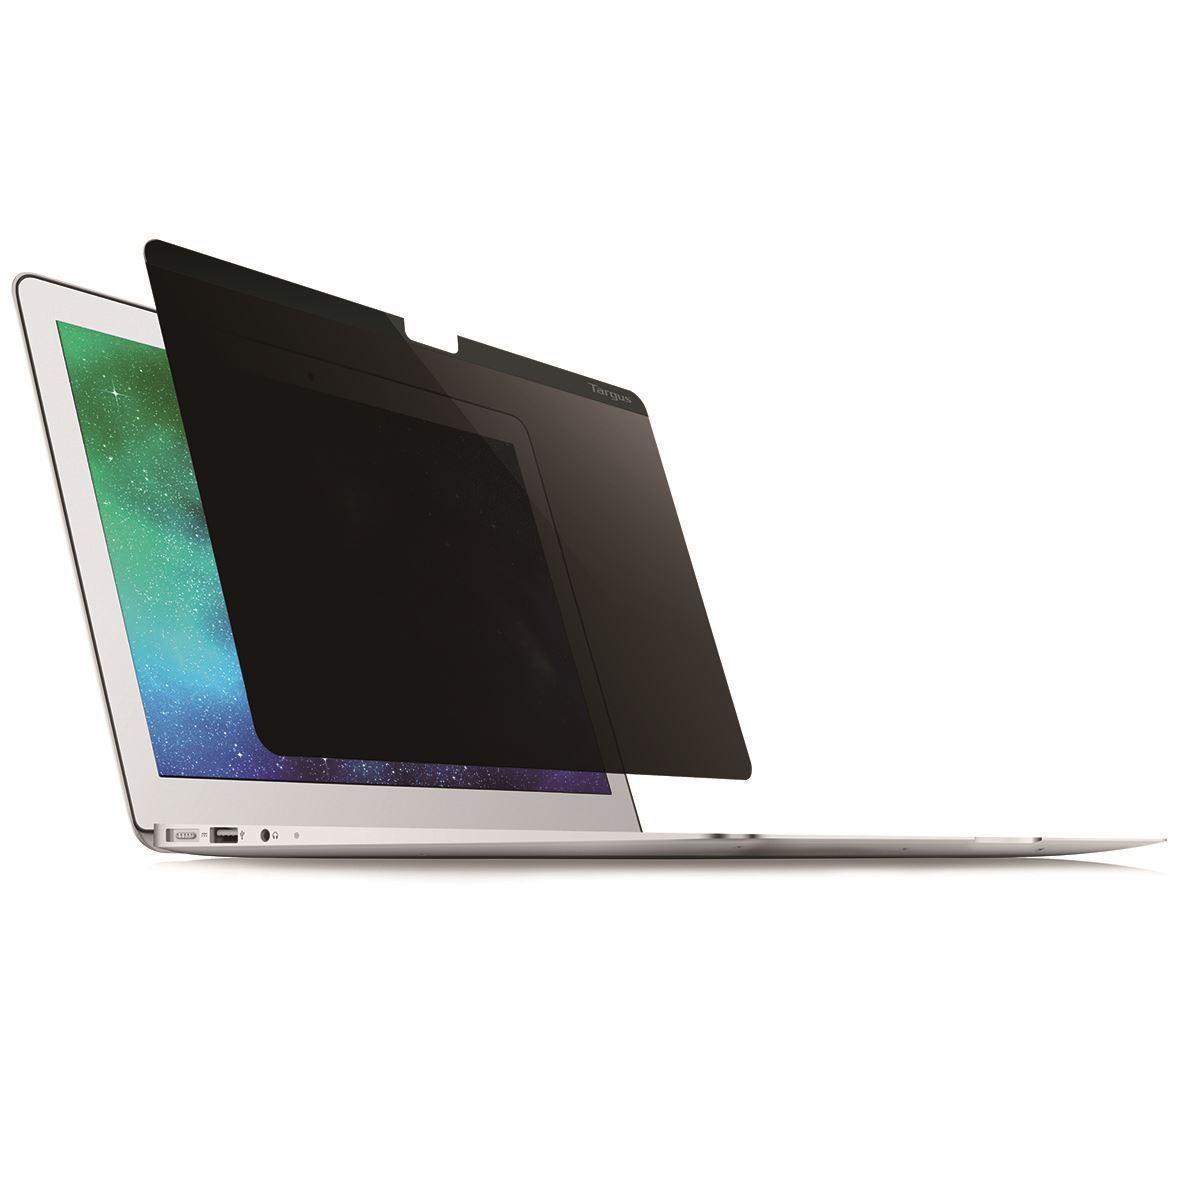 Targus ASM133MBP6GL Magnetic 13.3in Screen For MacBook 2016 (pc)